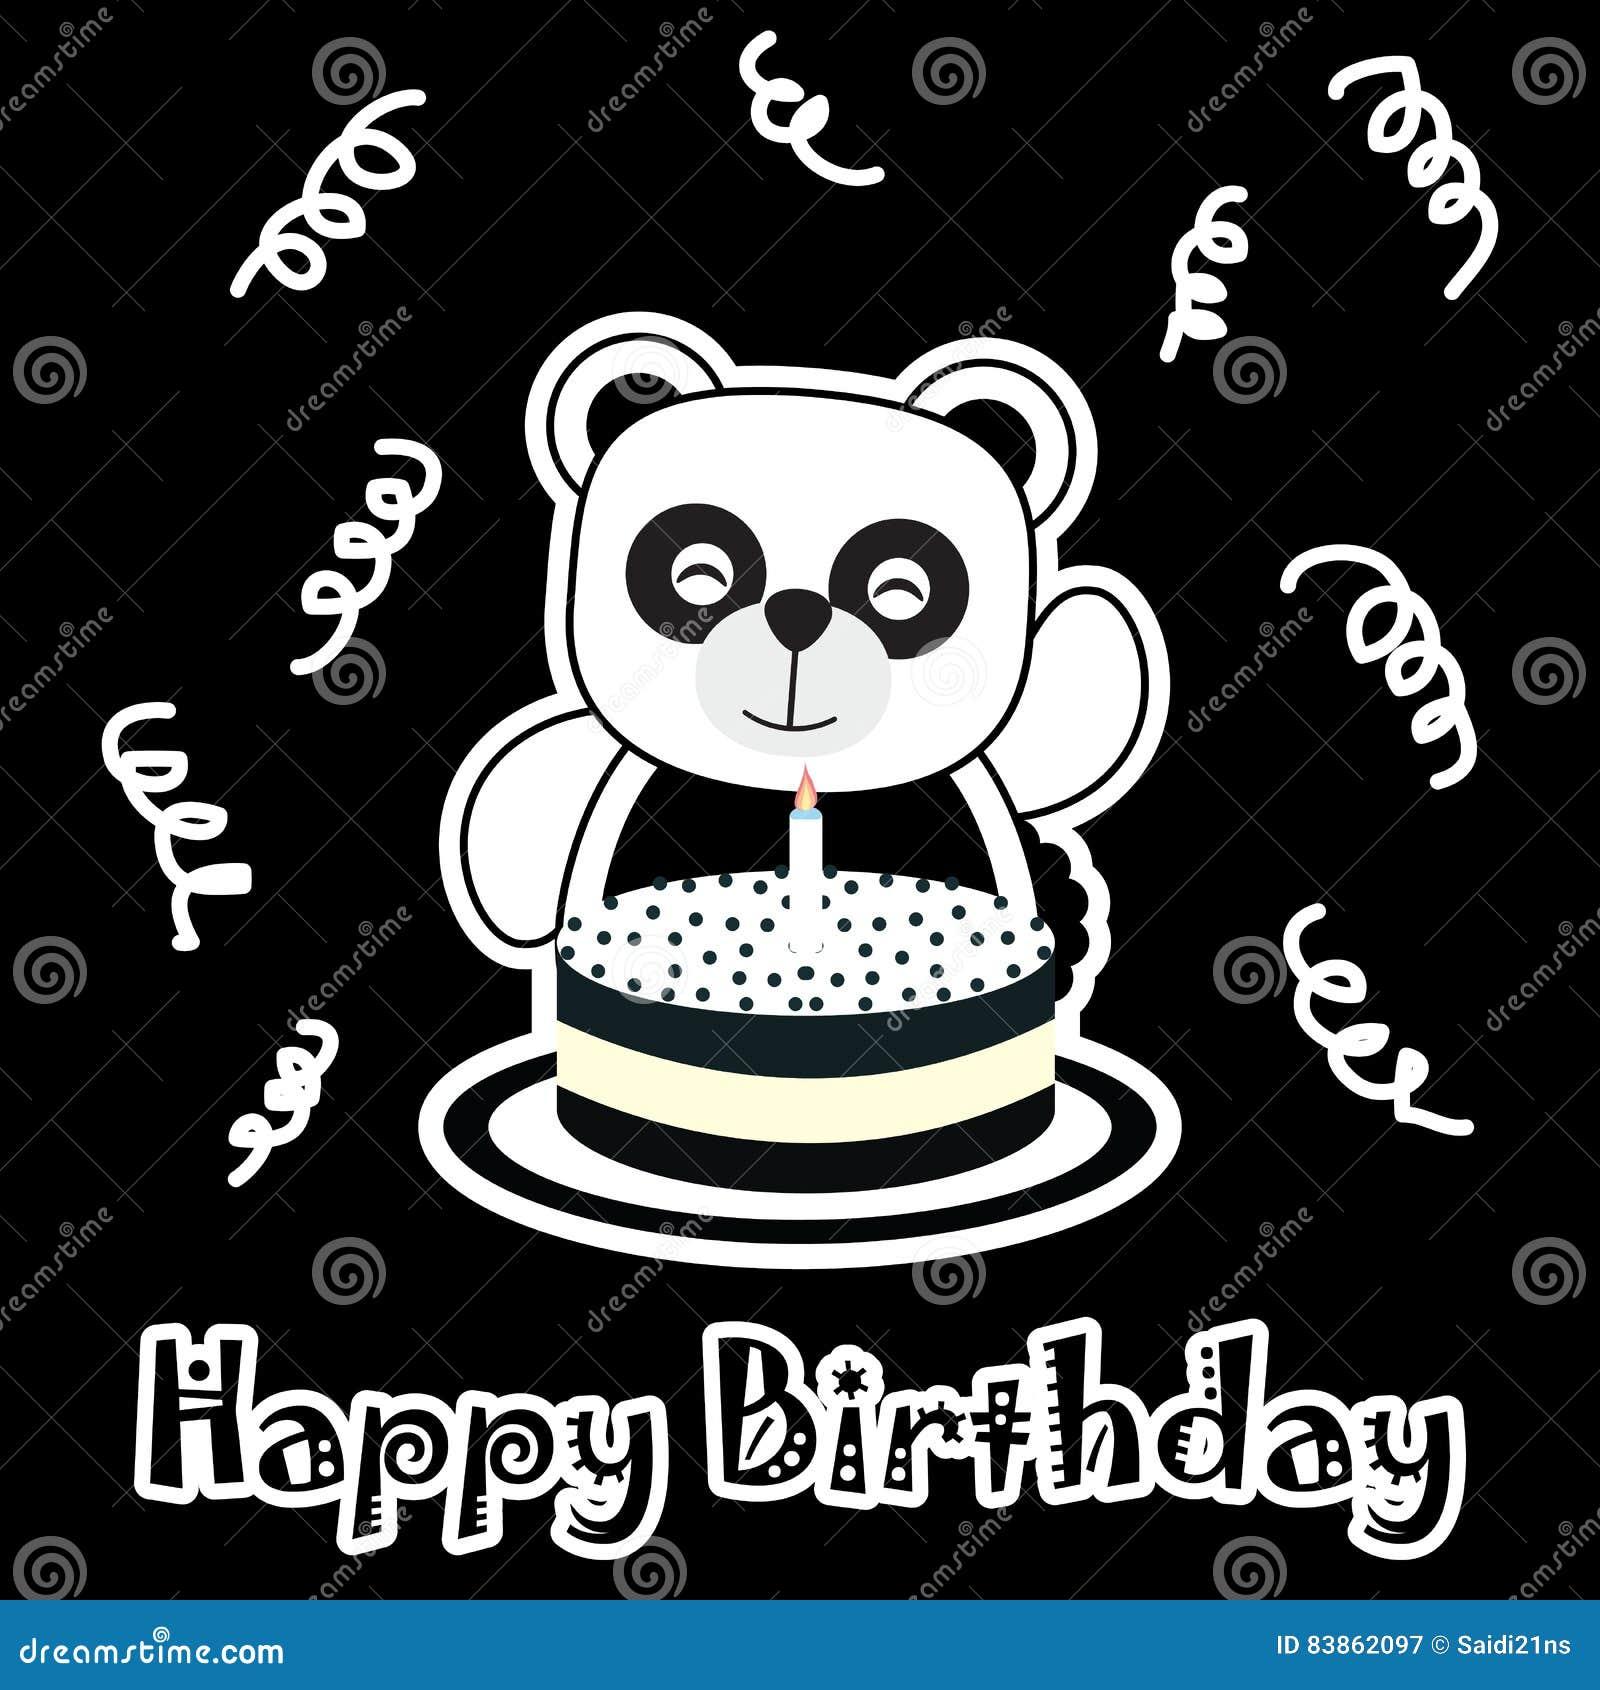 Birthday Illustration With Cute Baby Panda With Birthday Cake Stock